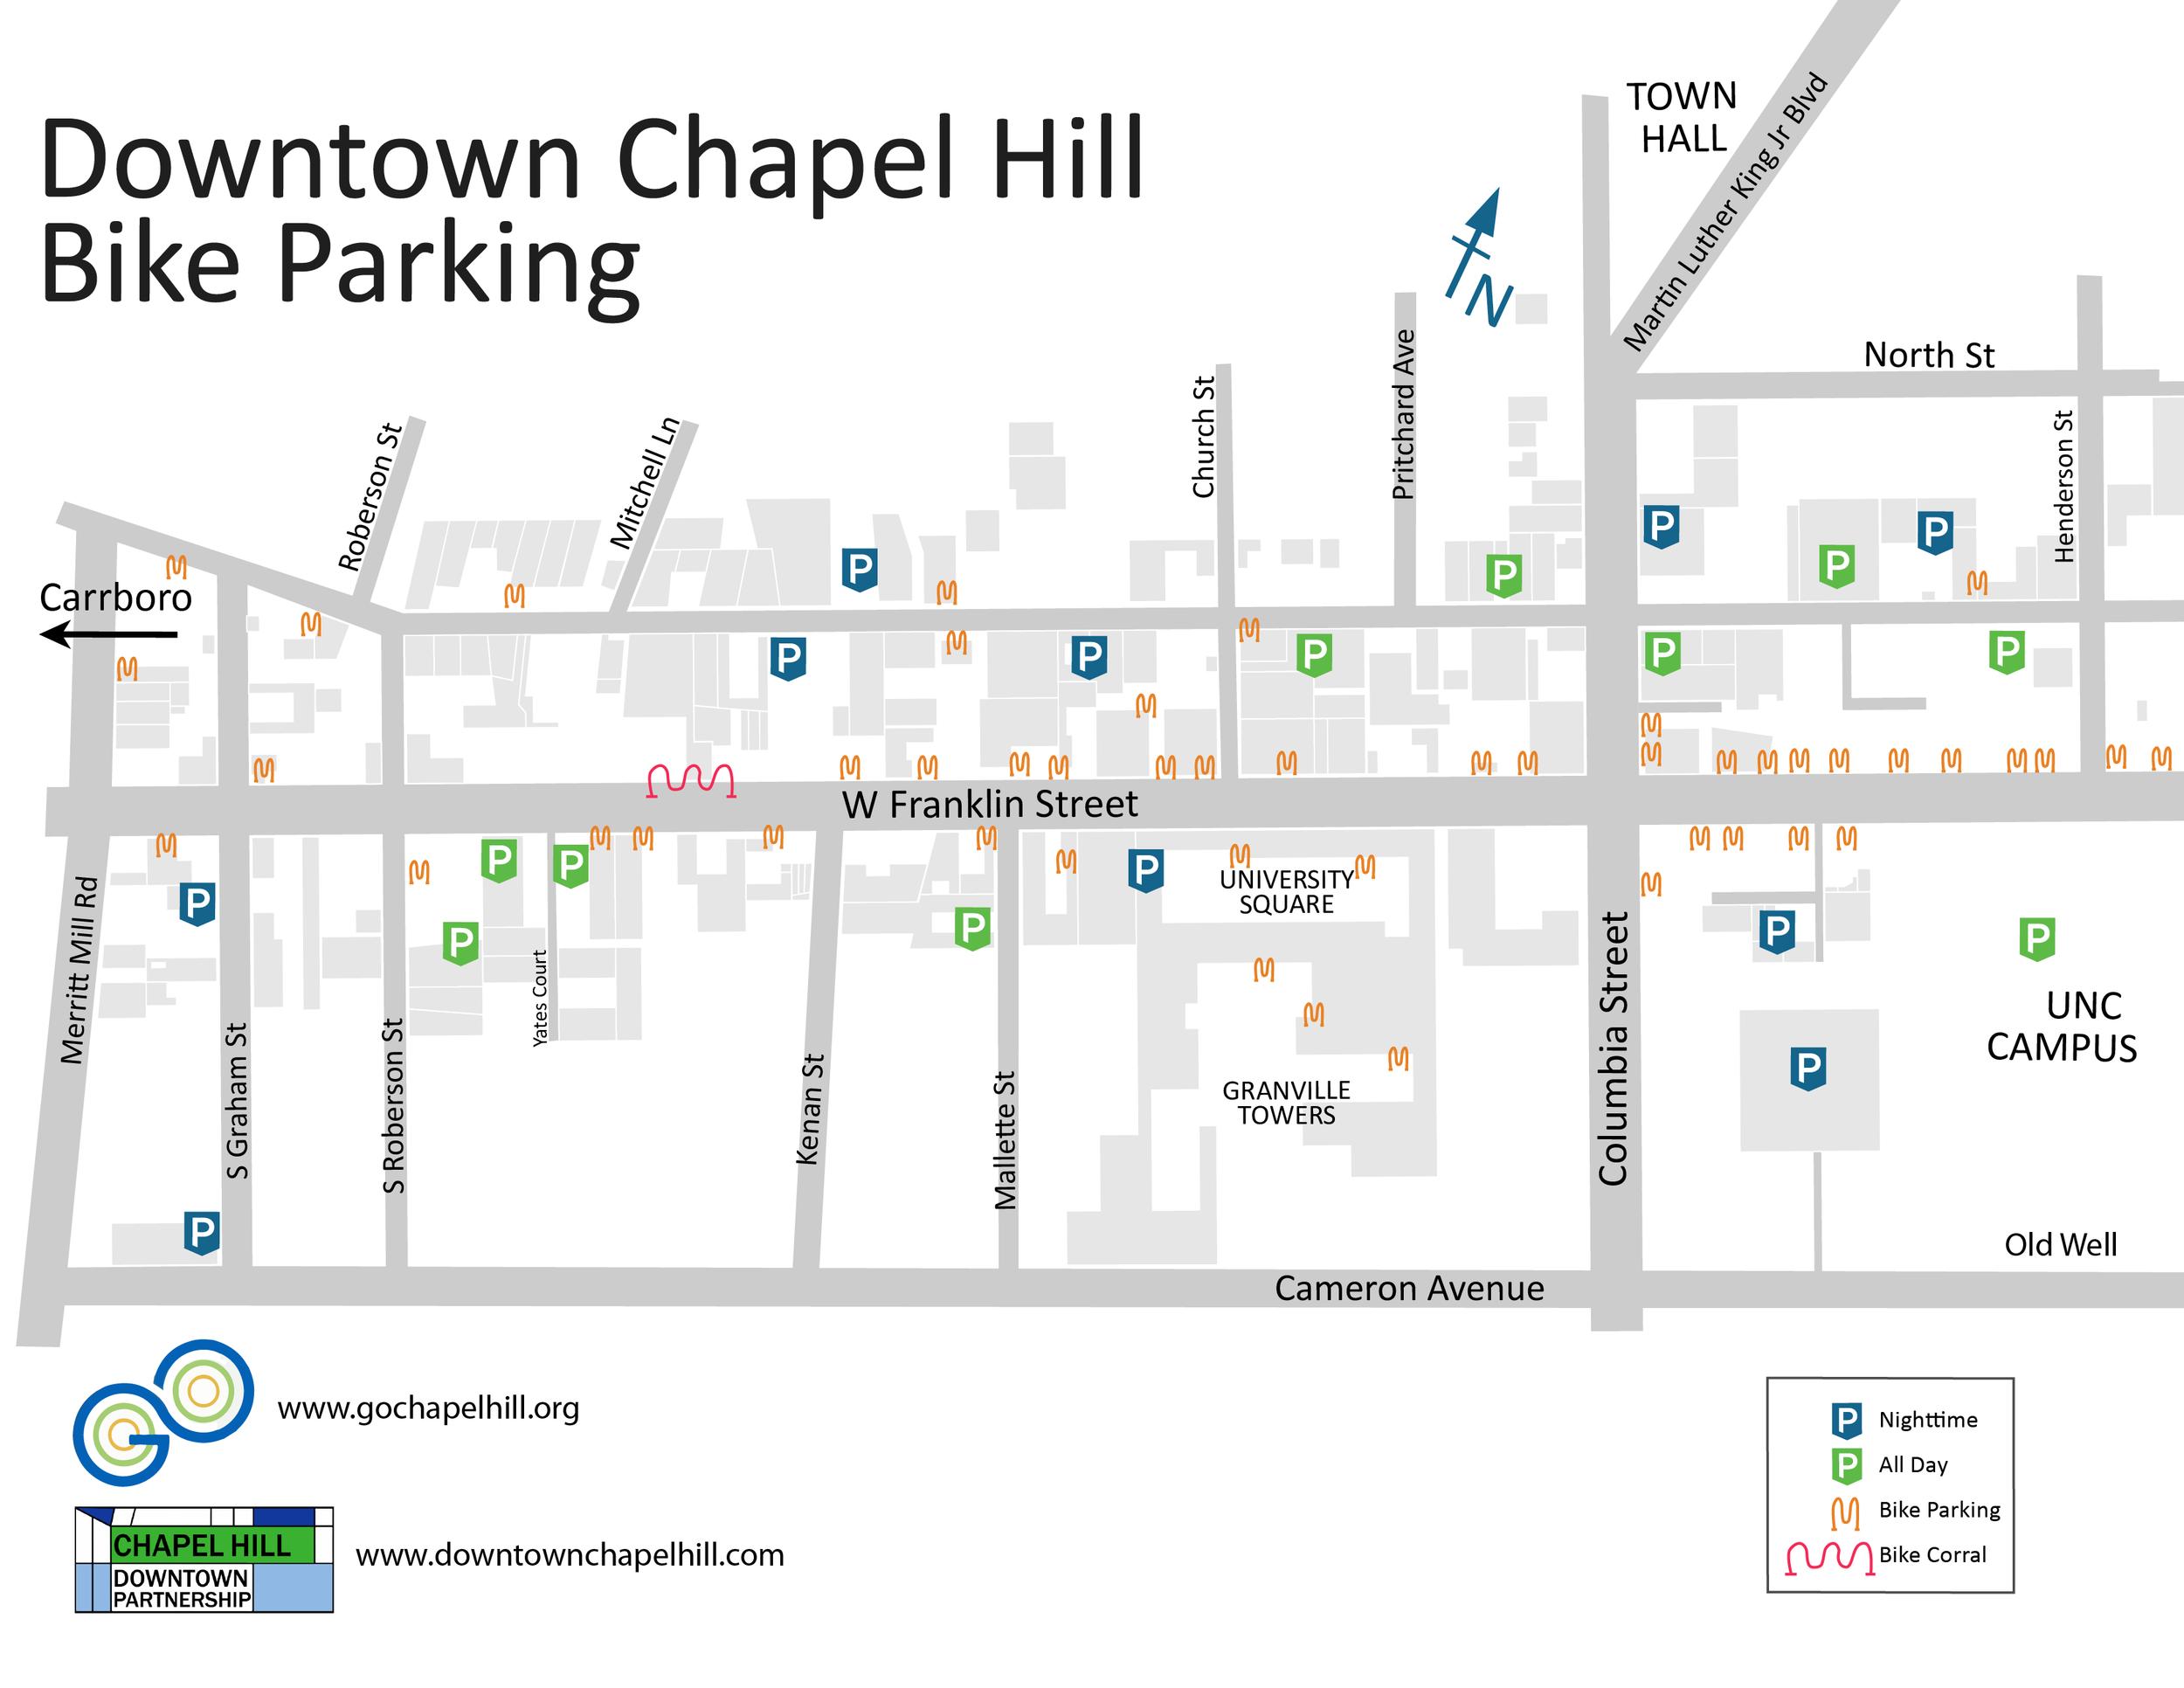 Downtown Bike Parking Map